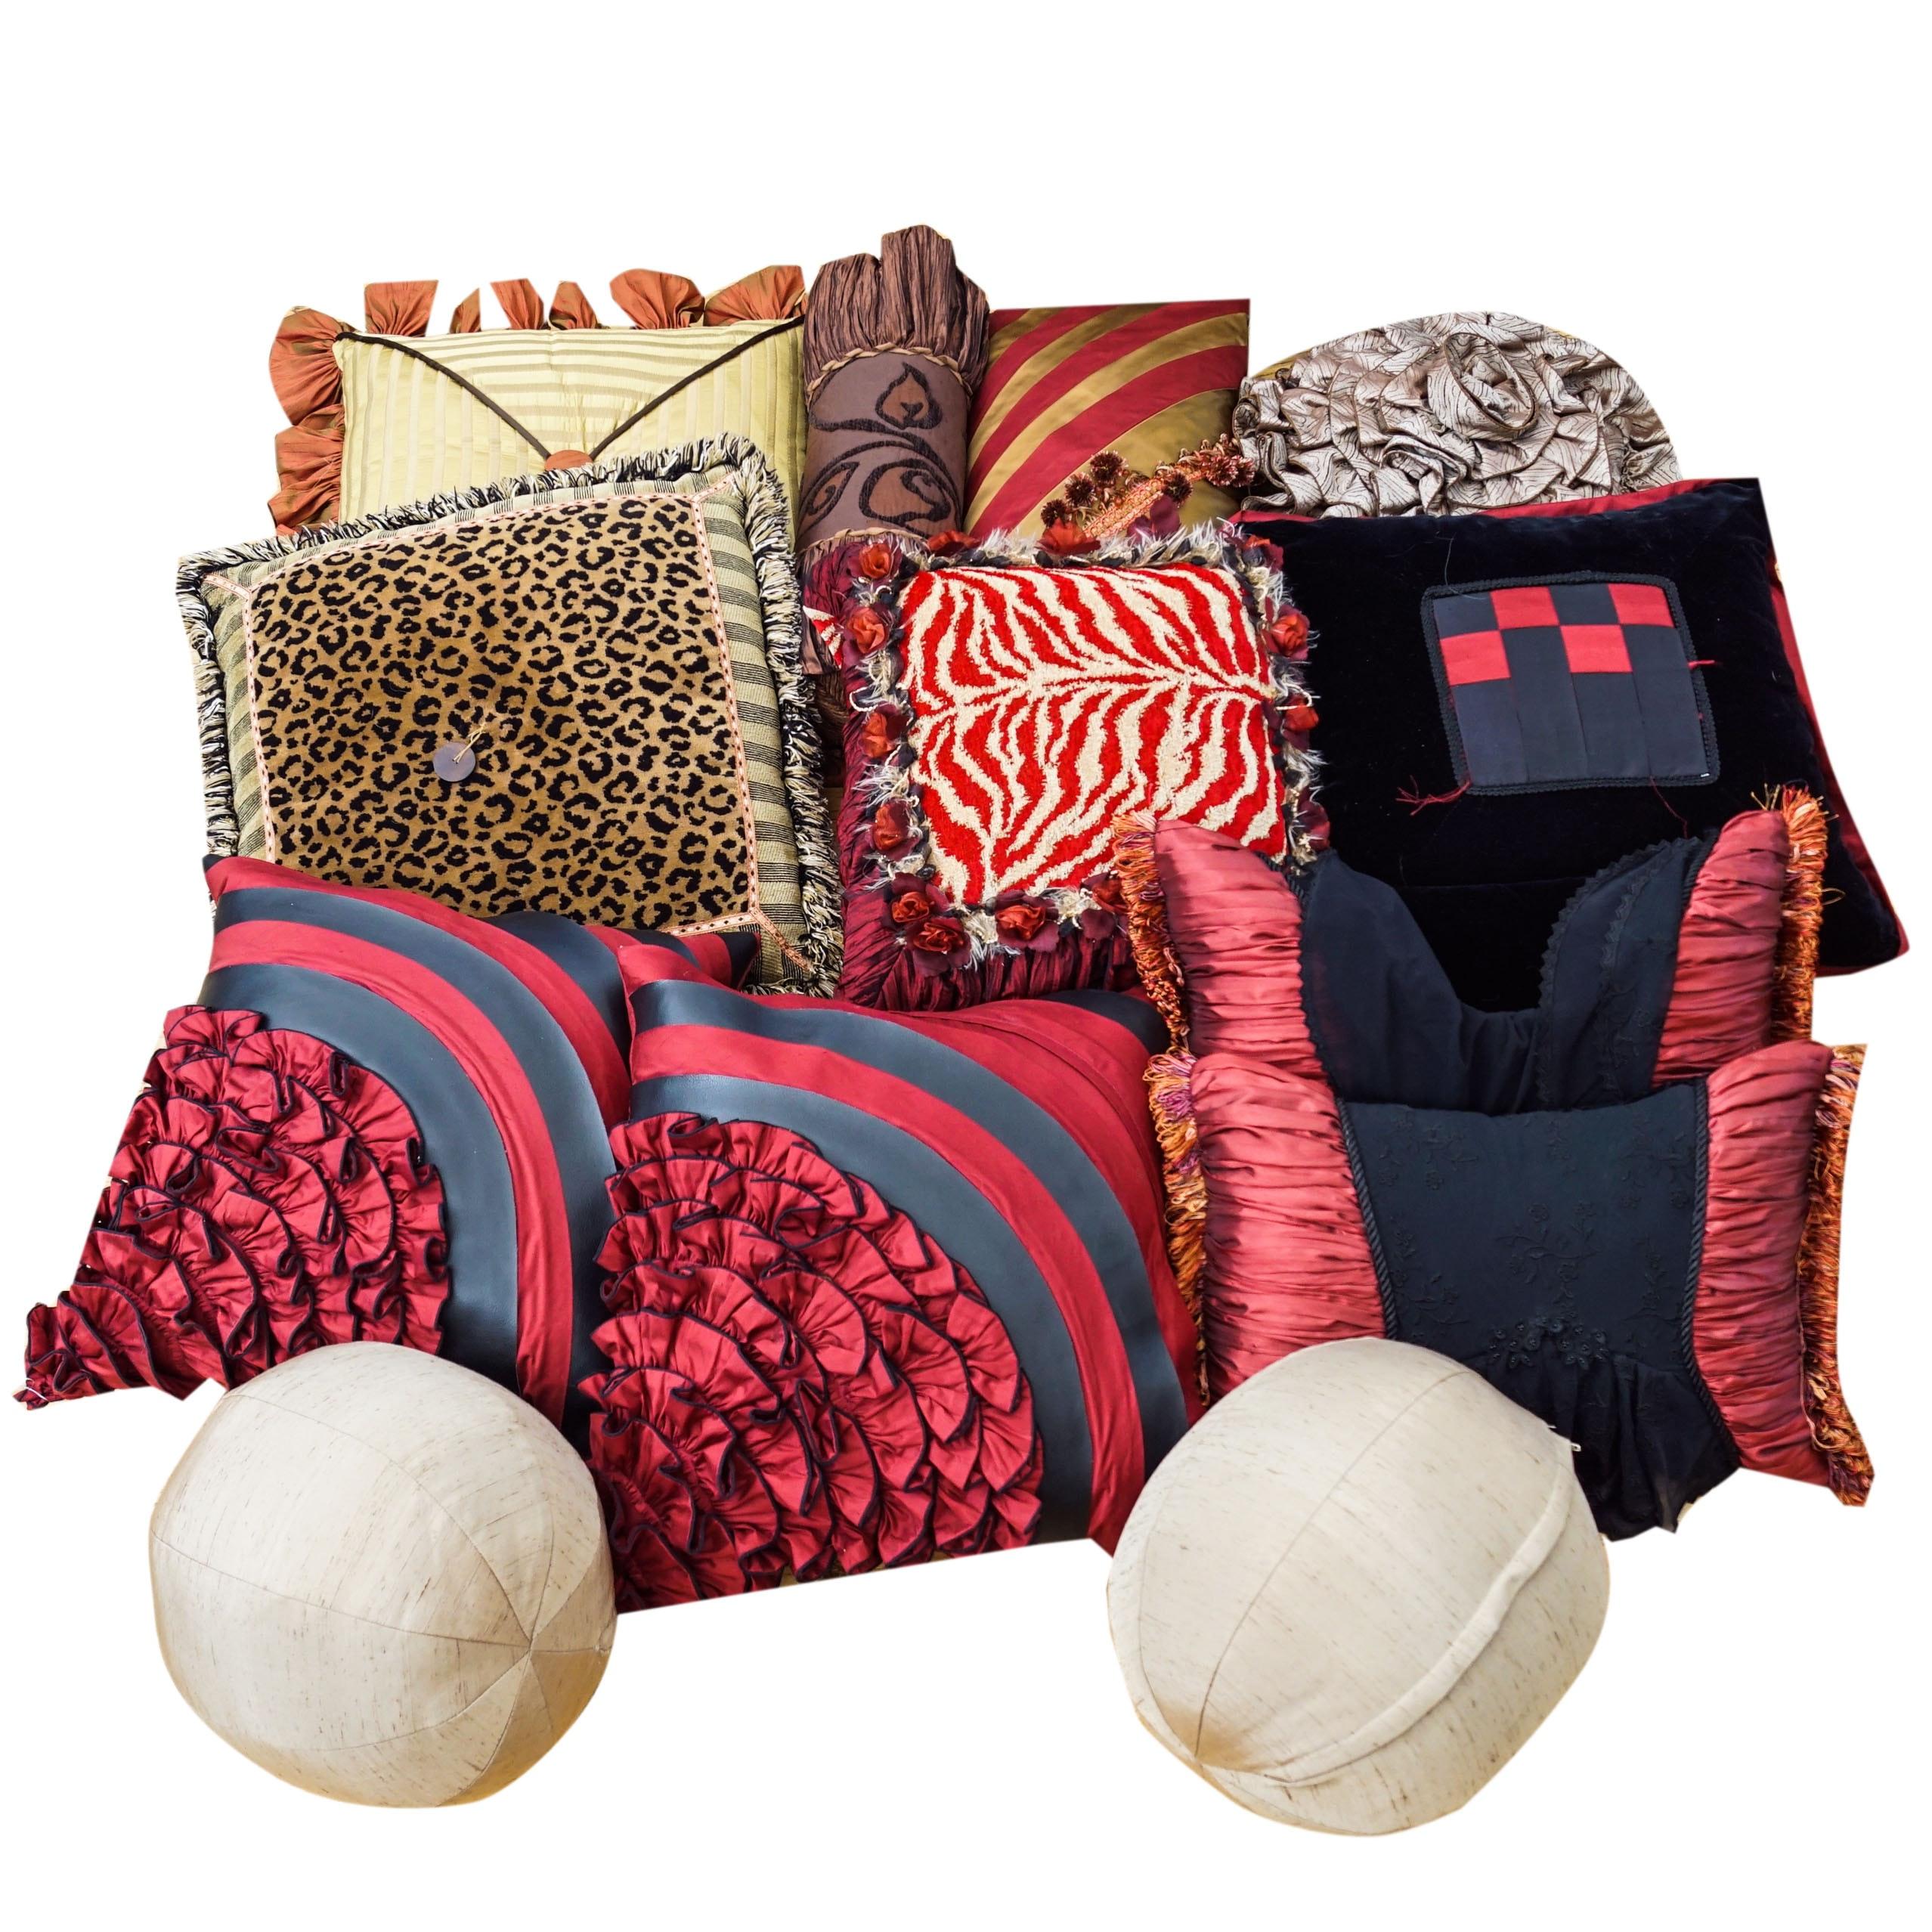 Collection of Decorative Throw Pillows.